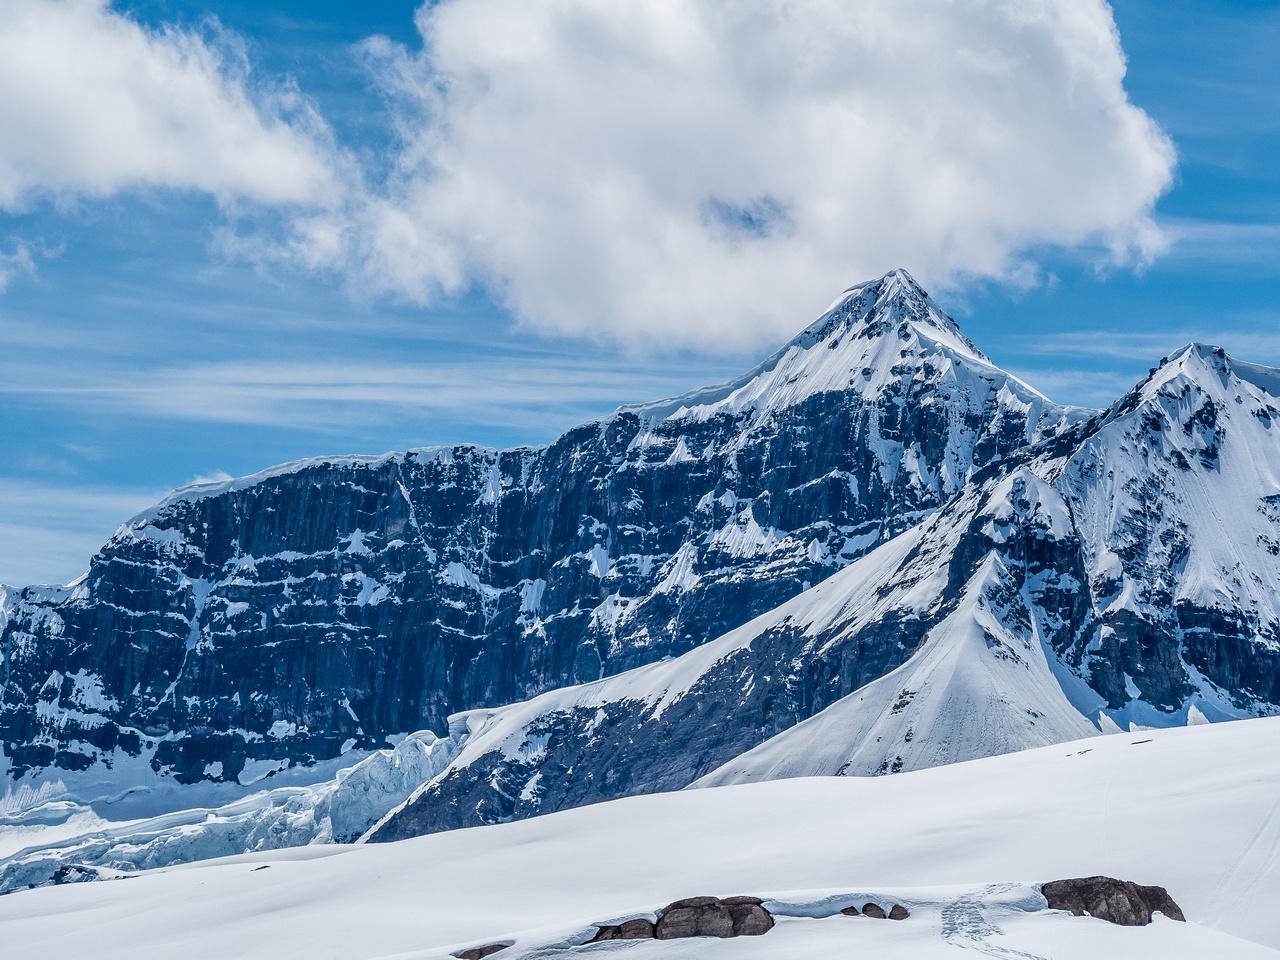 King Peak